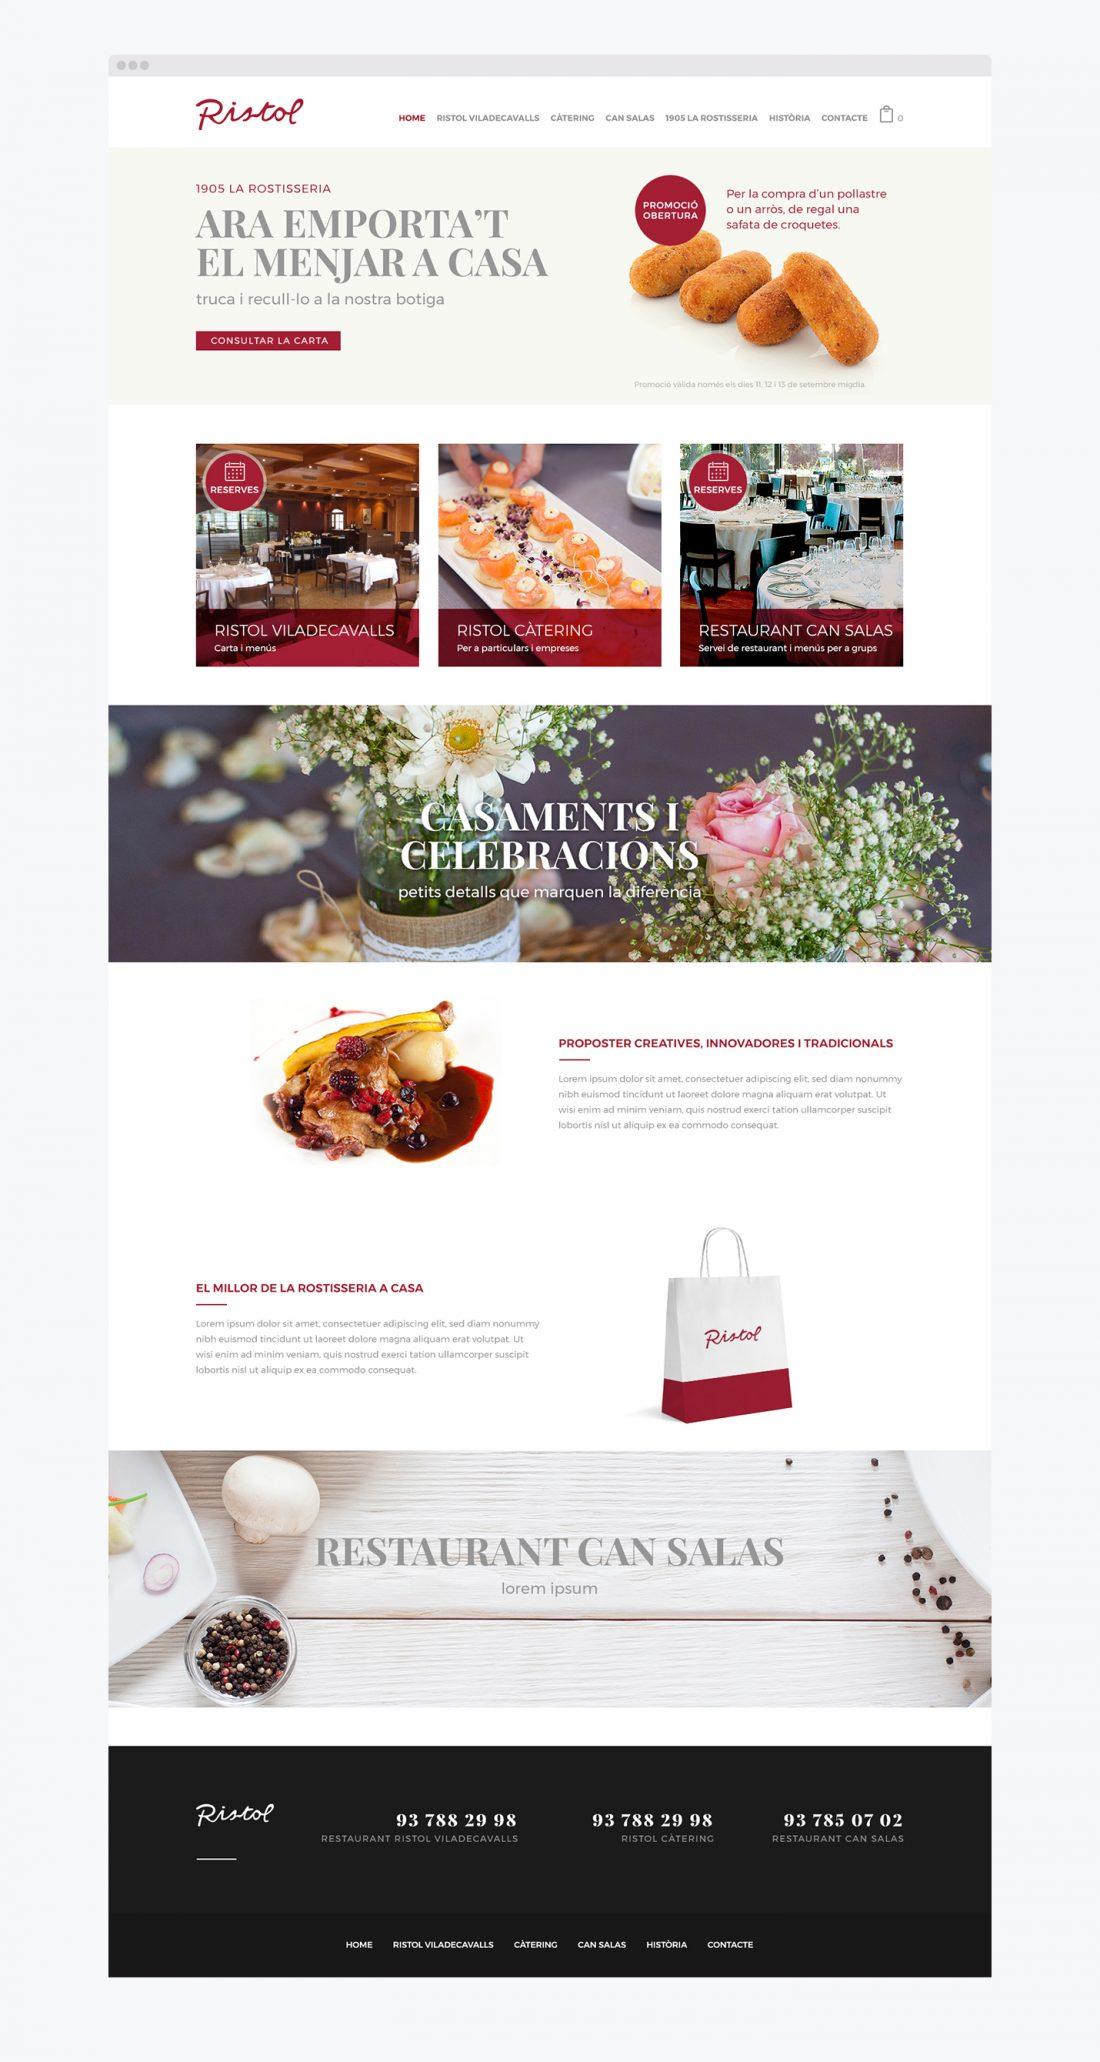 La Rostisseria_disseny_web_Viladecavalls